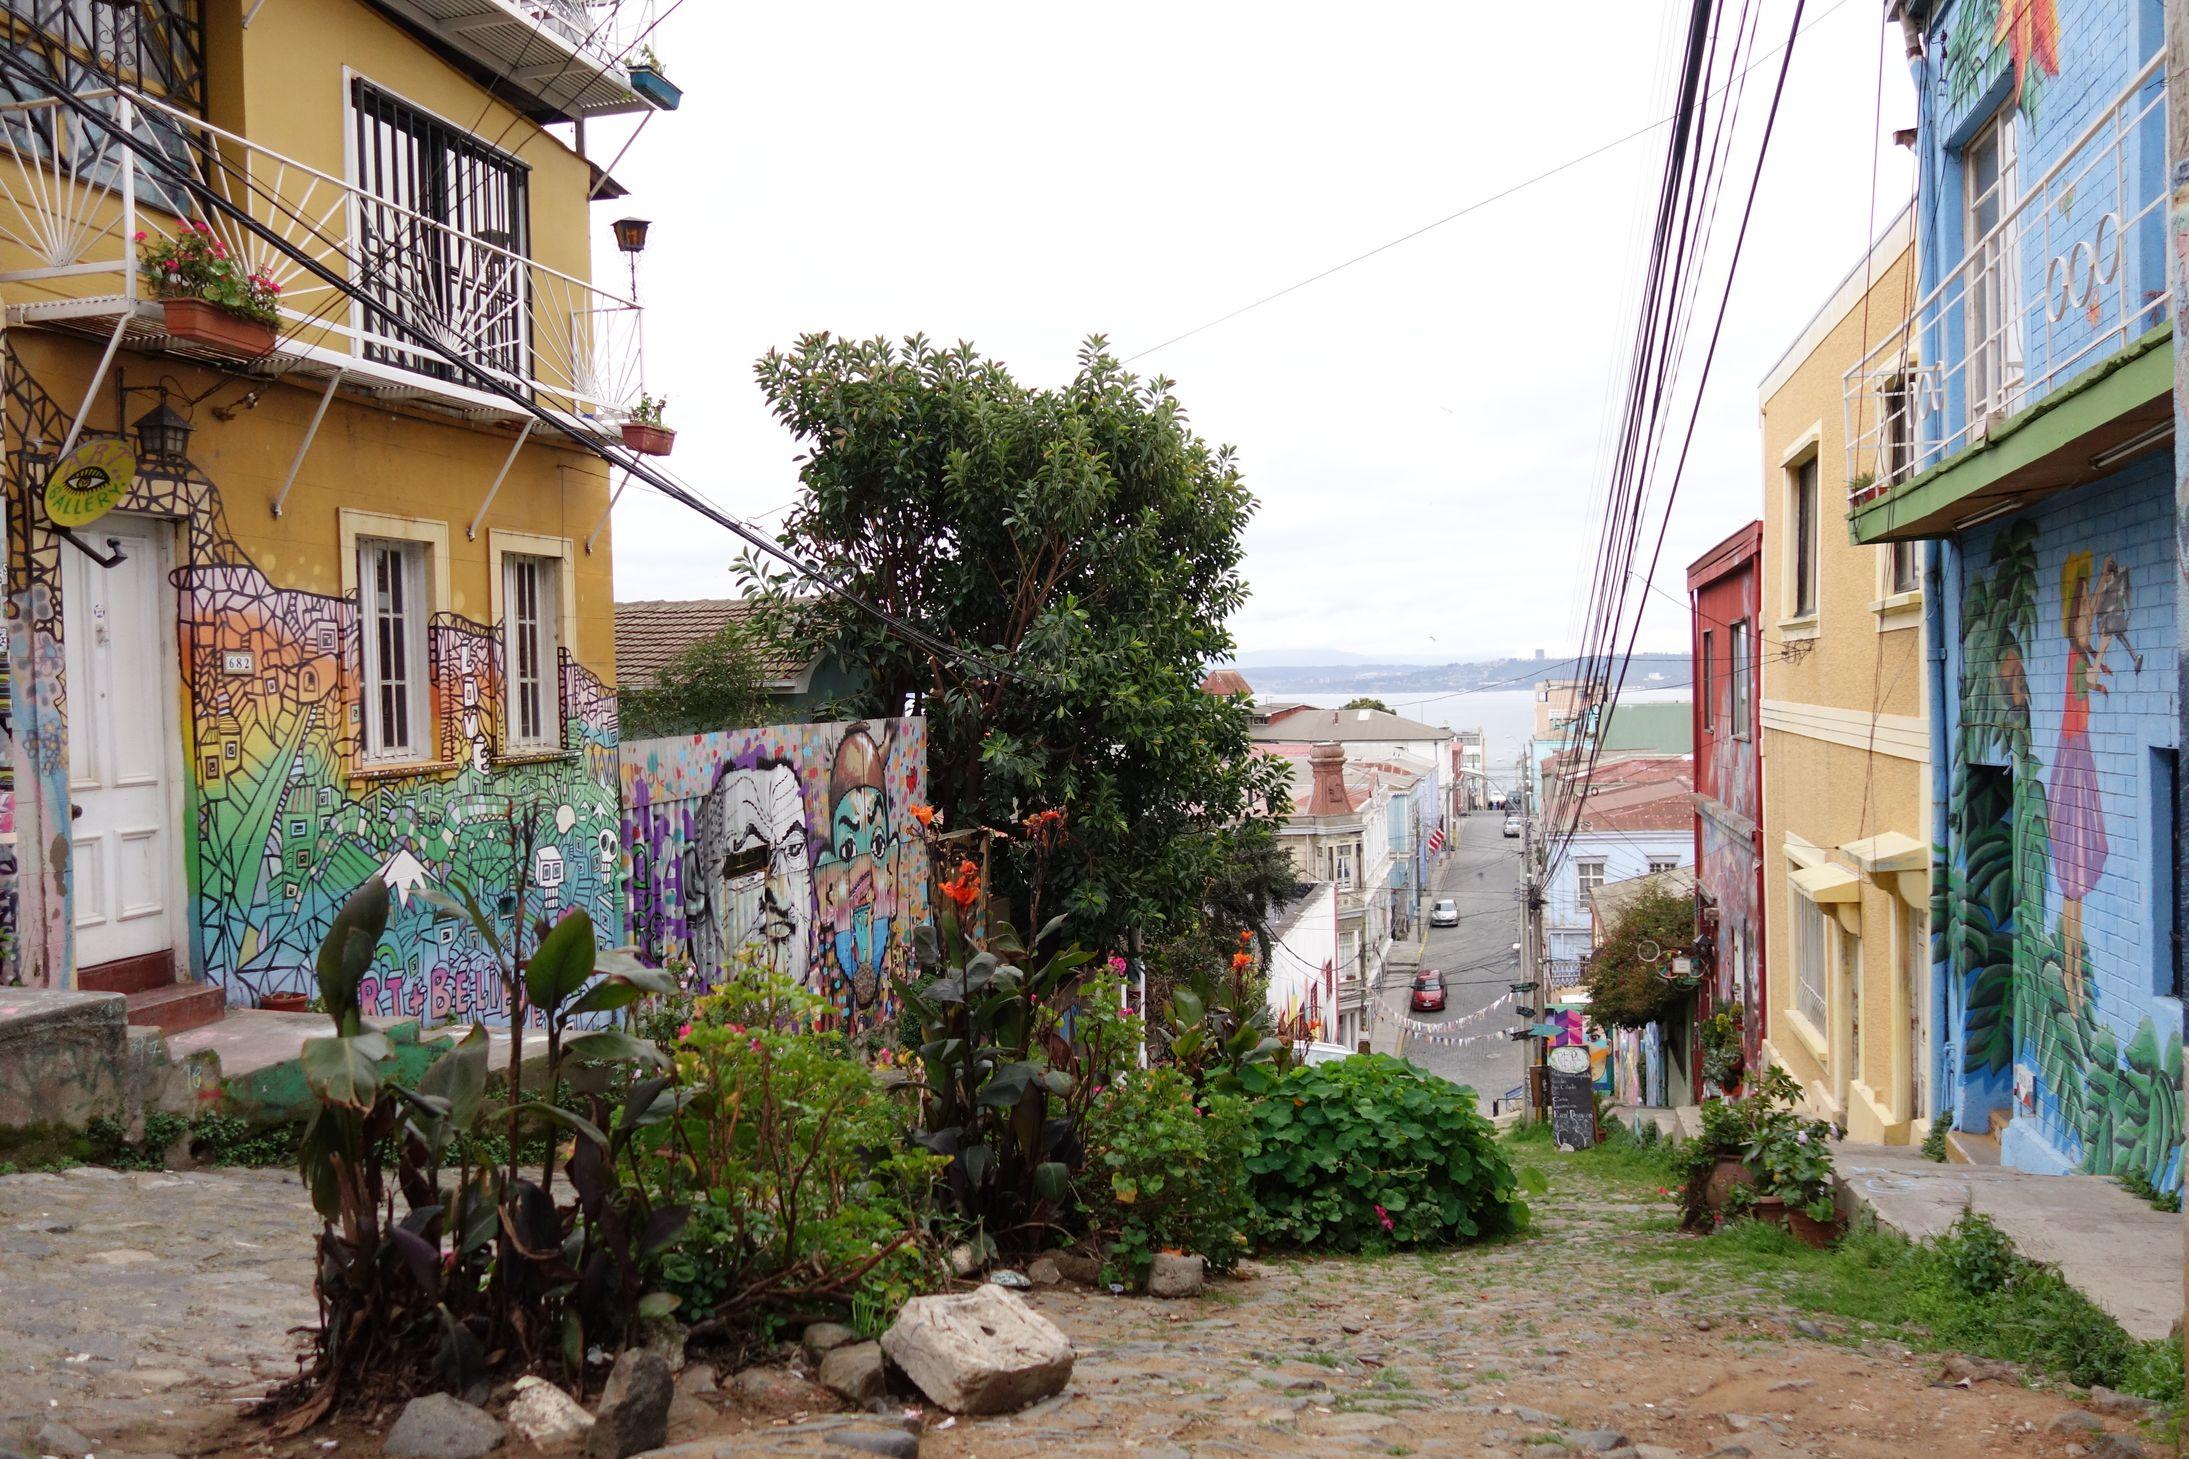 Rue_Valparaiso_Chili